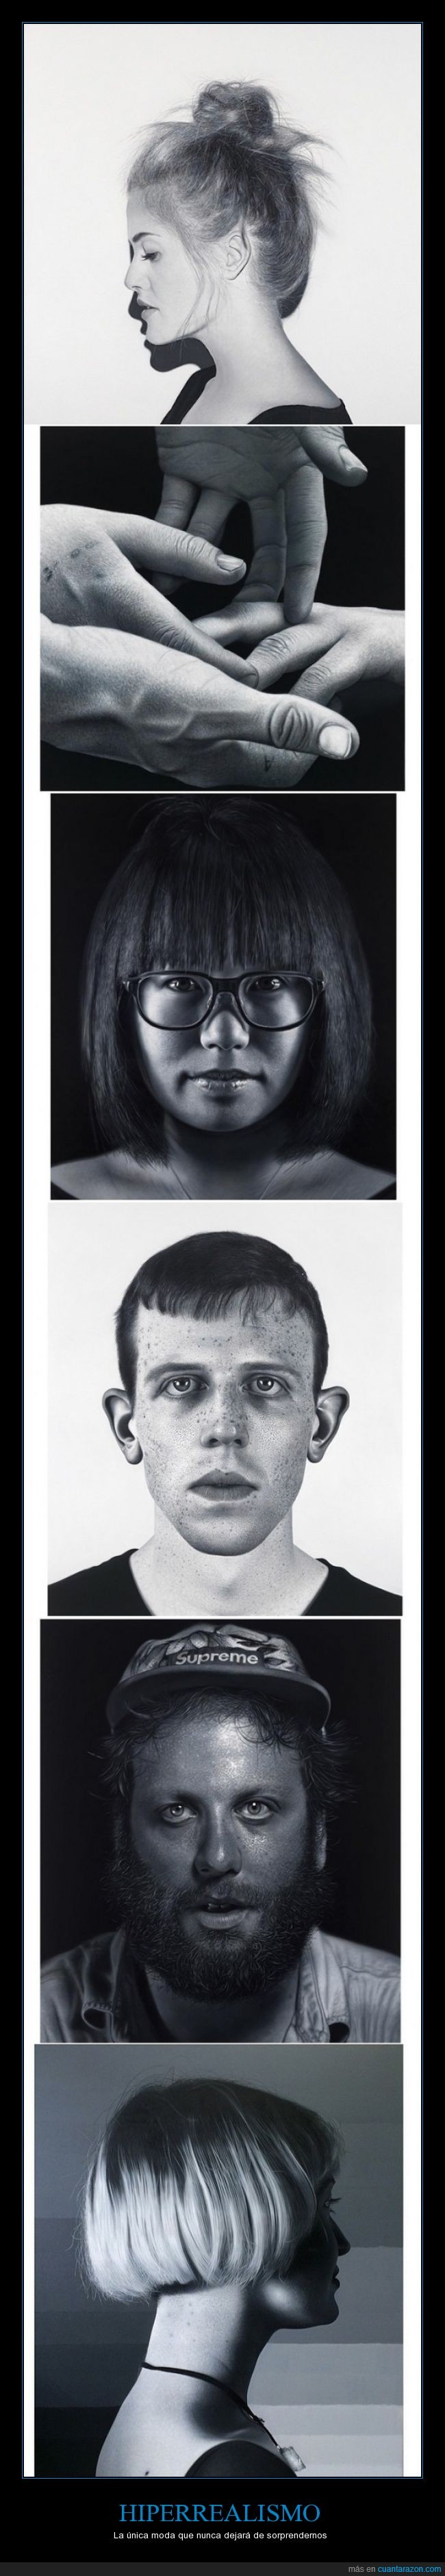 arte,artista,Charles Bierk,hiperrealismo,hiperrealista,imagen,personas,pintura